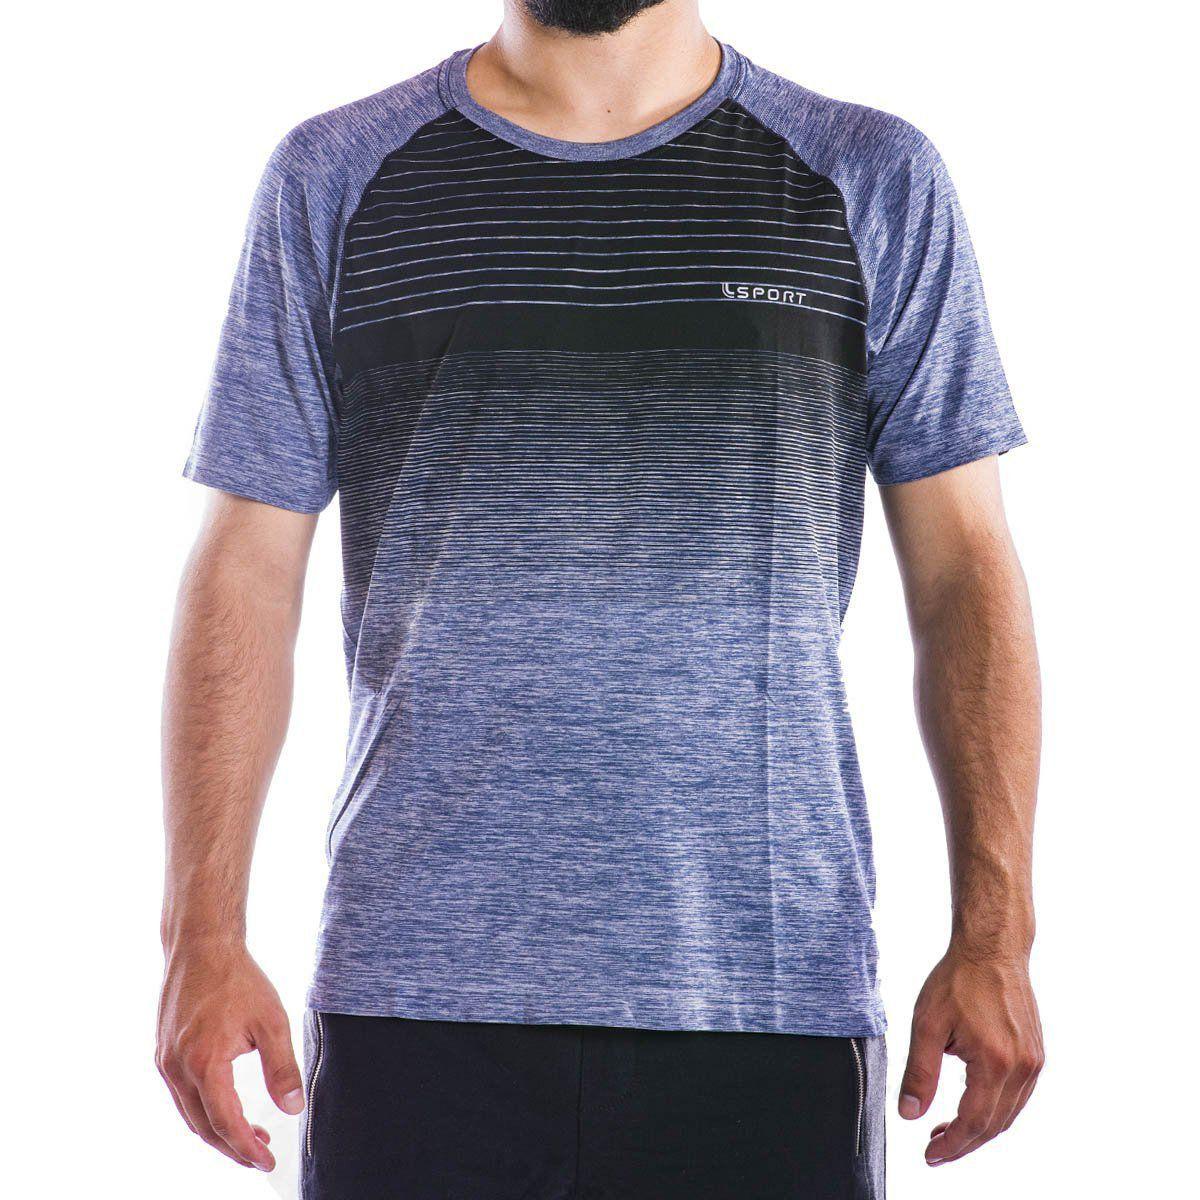 Camiseta Listras Lupo Sport Masculina -